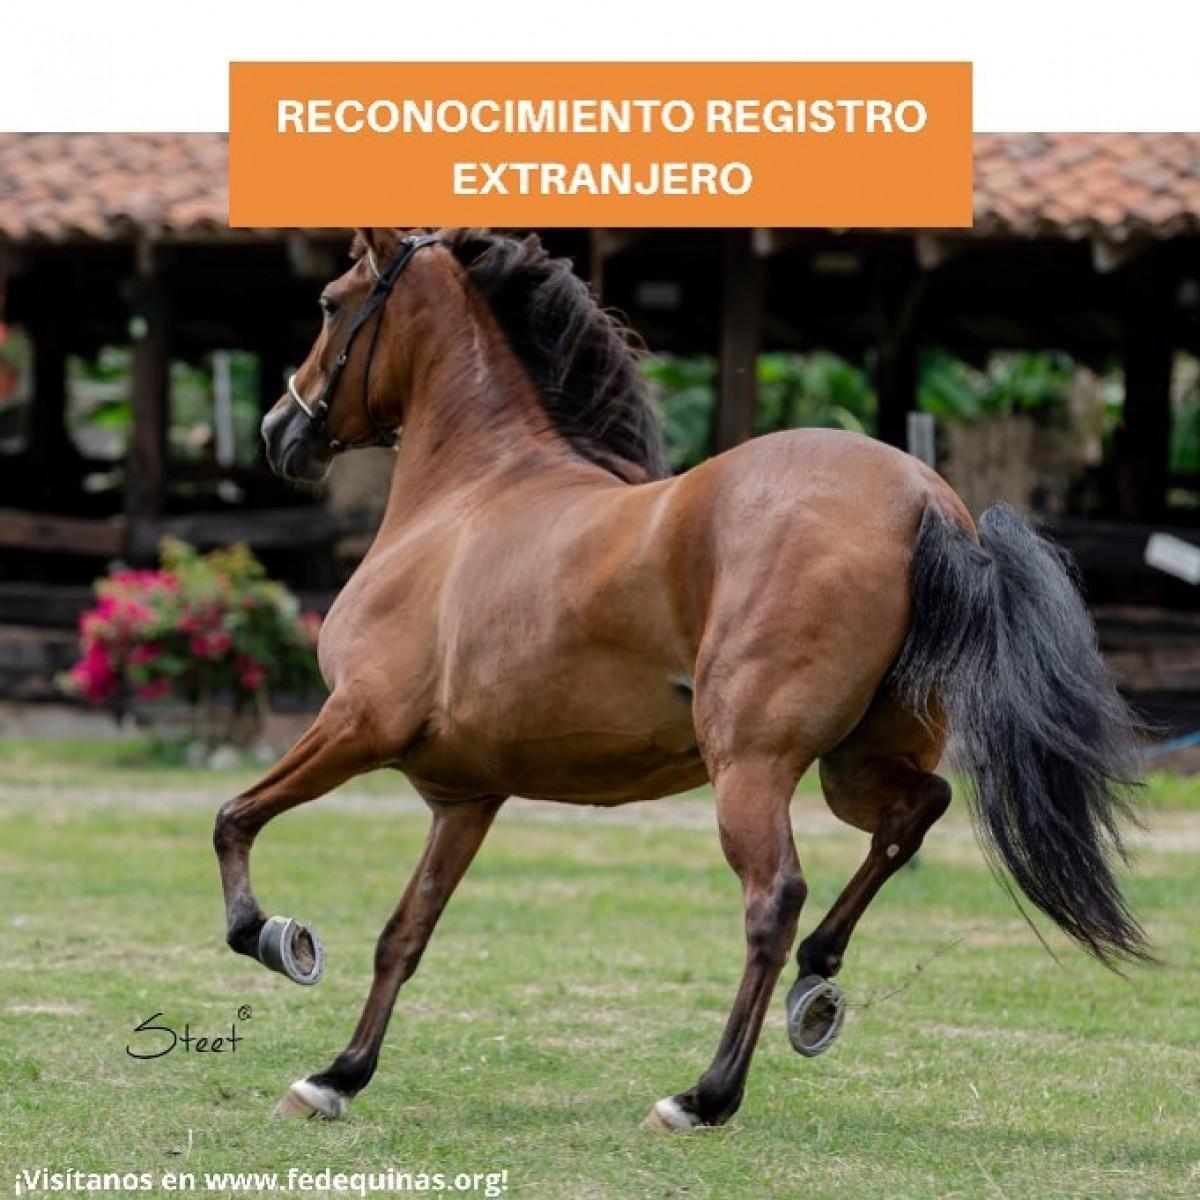 Fedequinas: Reconocimiento Registro Extranjero